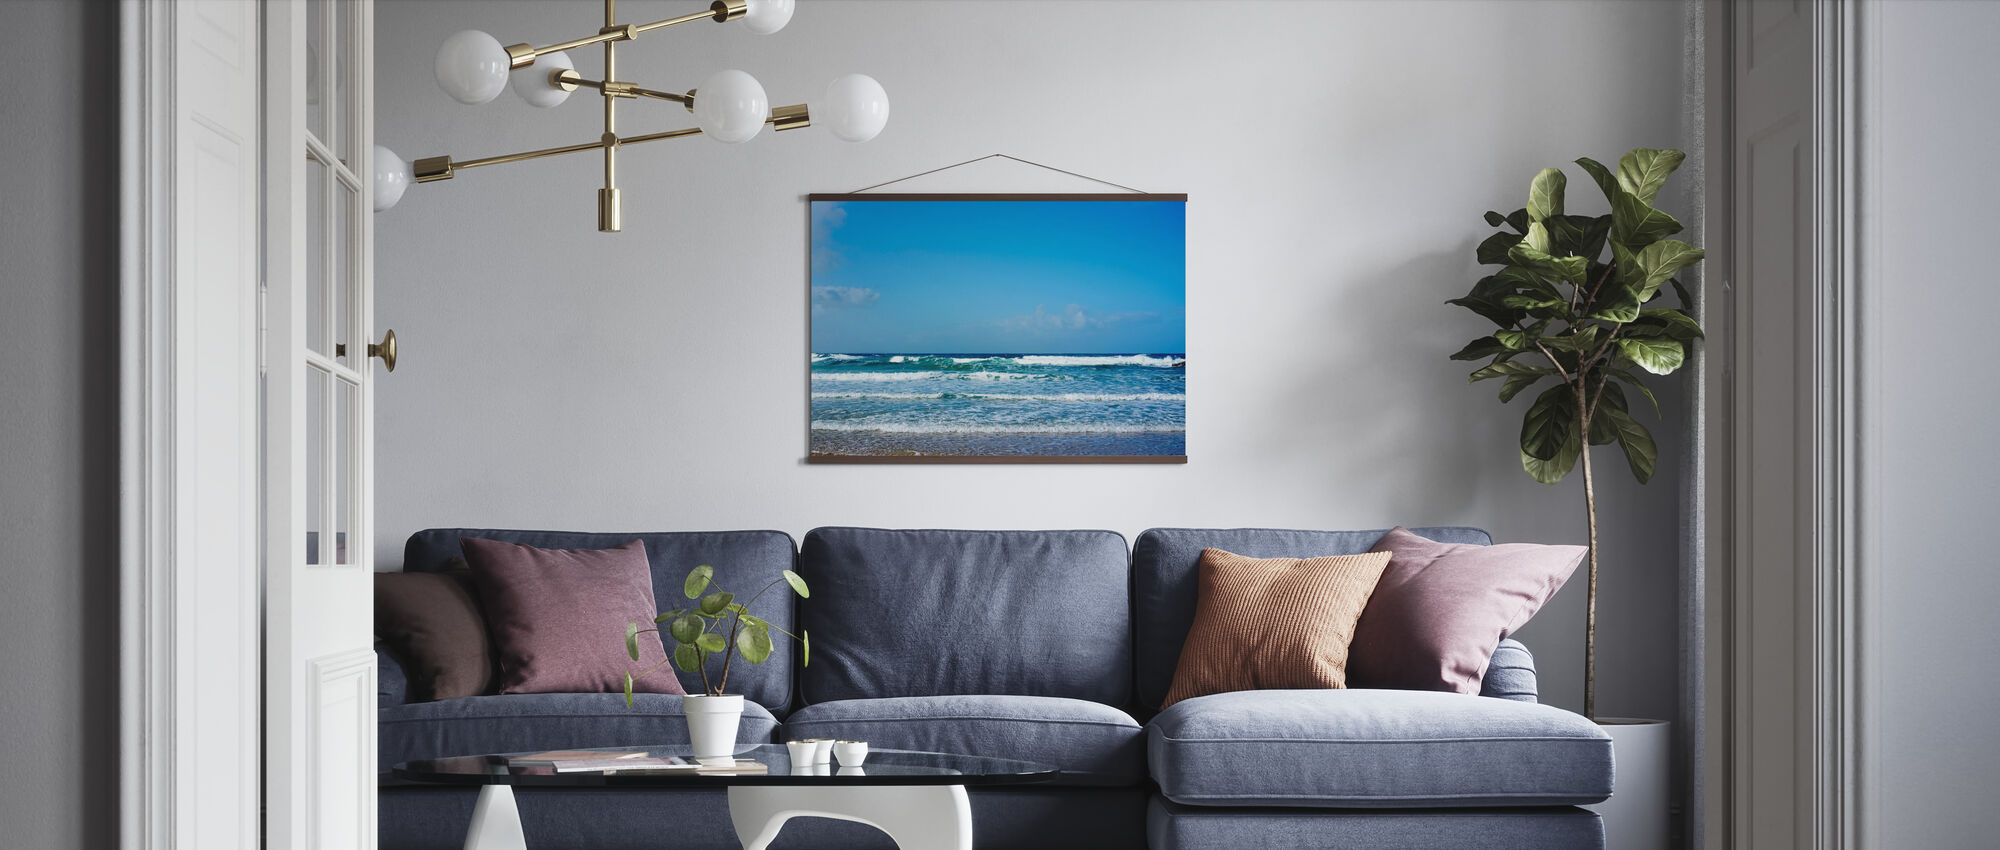 Soft Atlantic Waves - Poster - Living Room